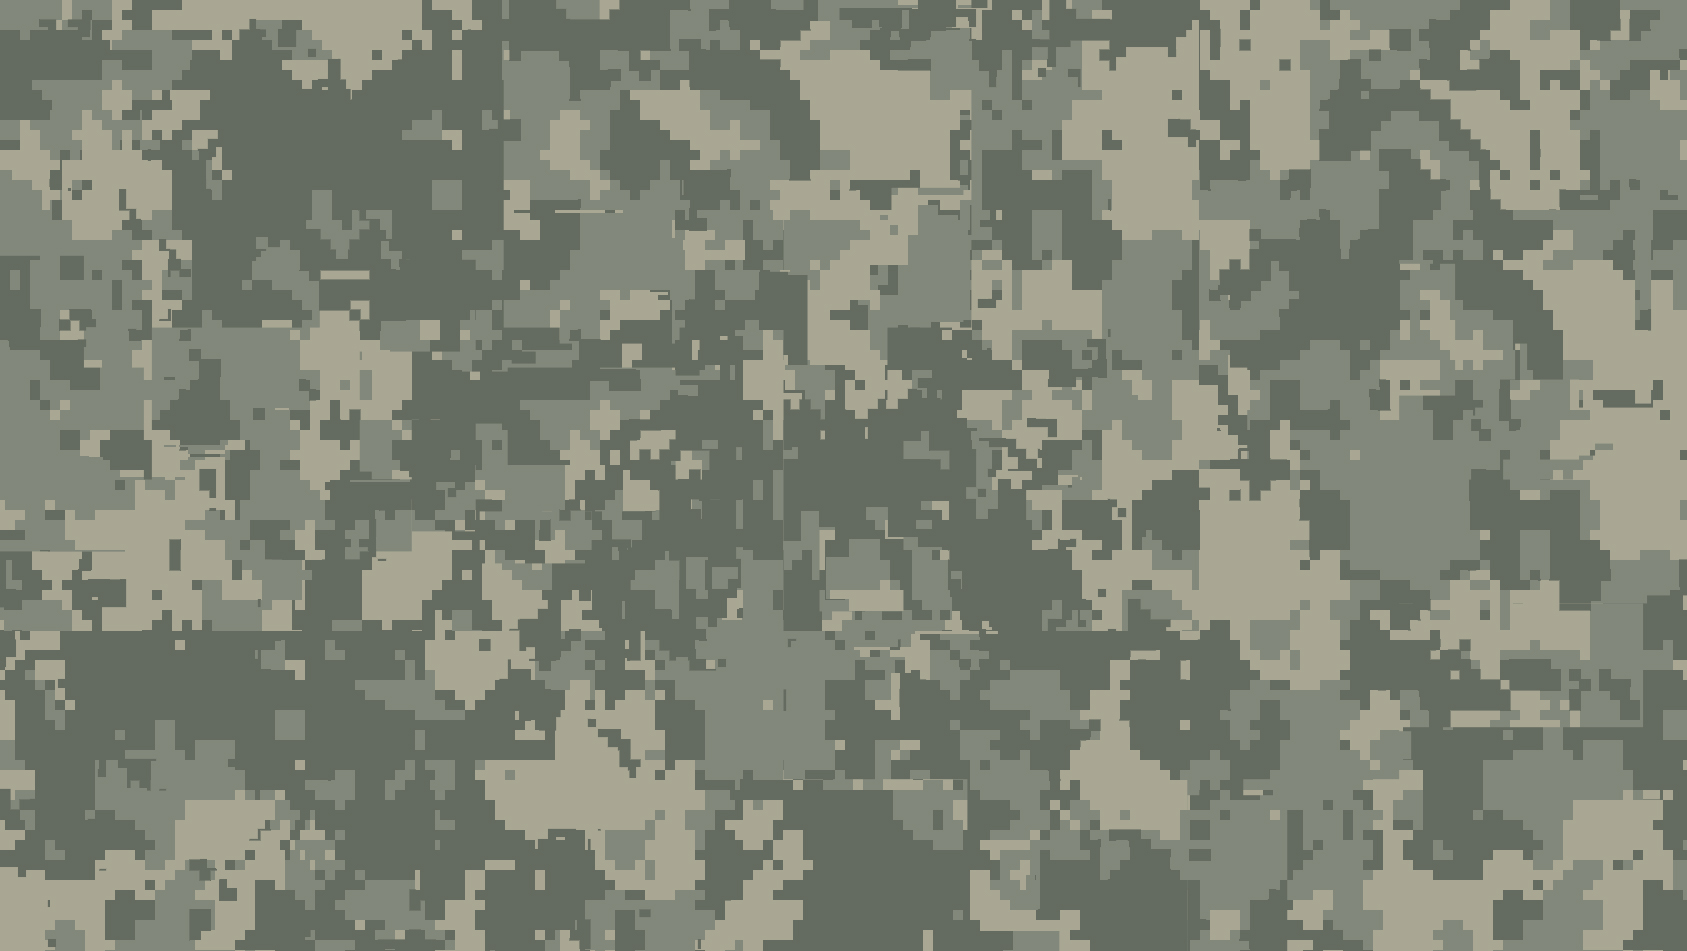 us air force camo wallpaper - photo #33